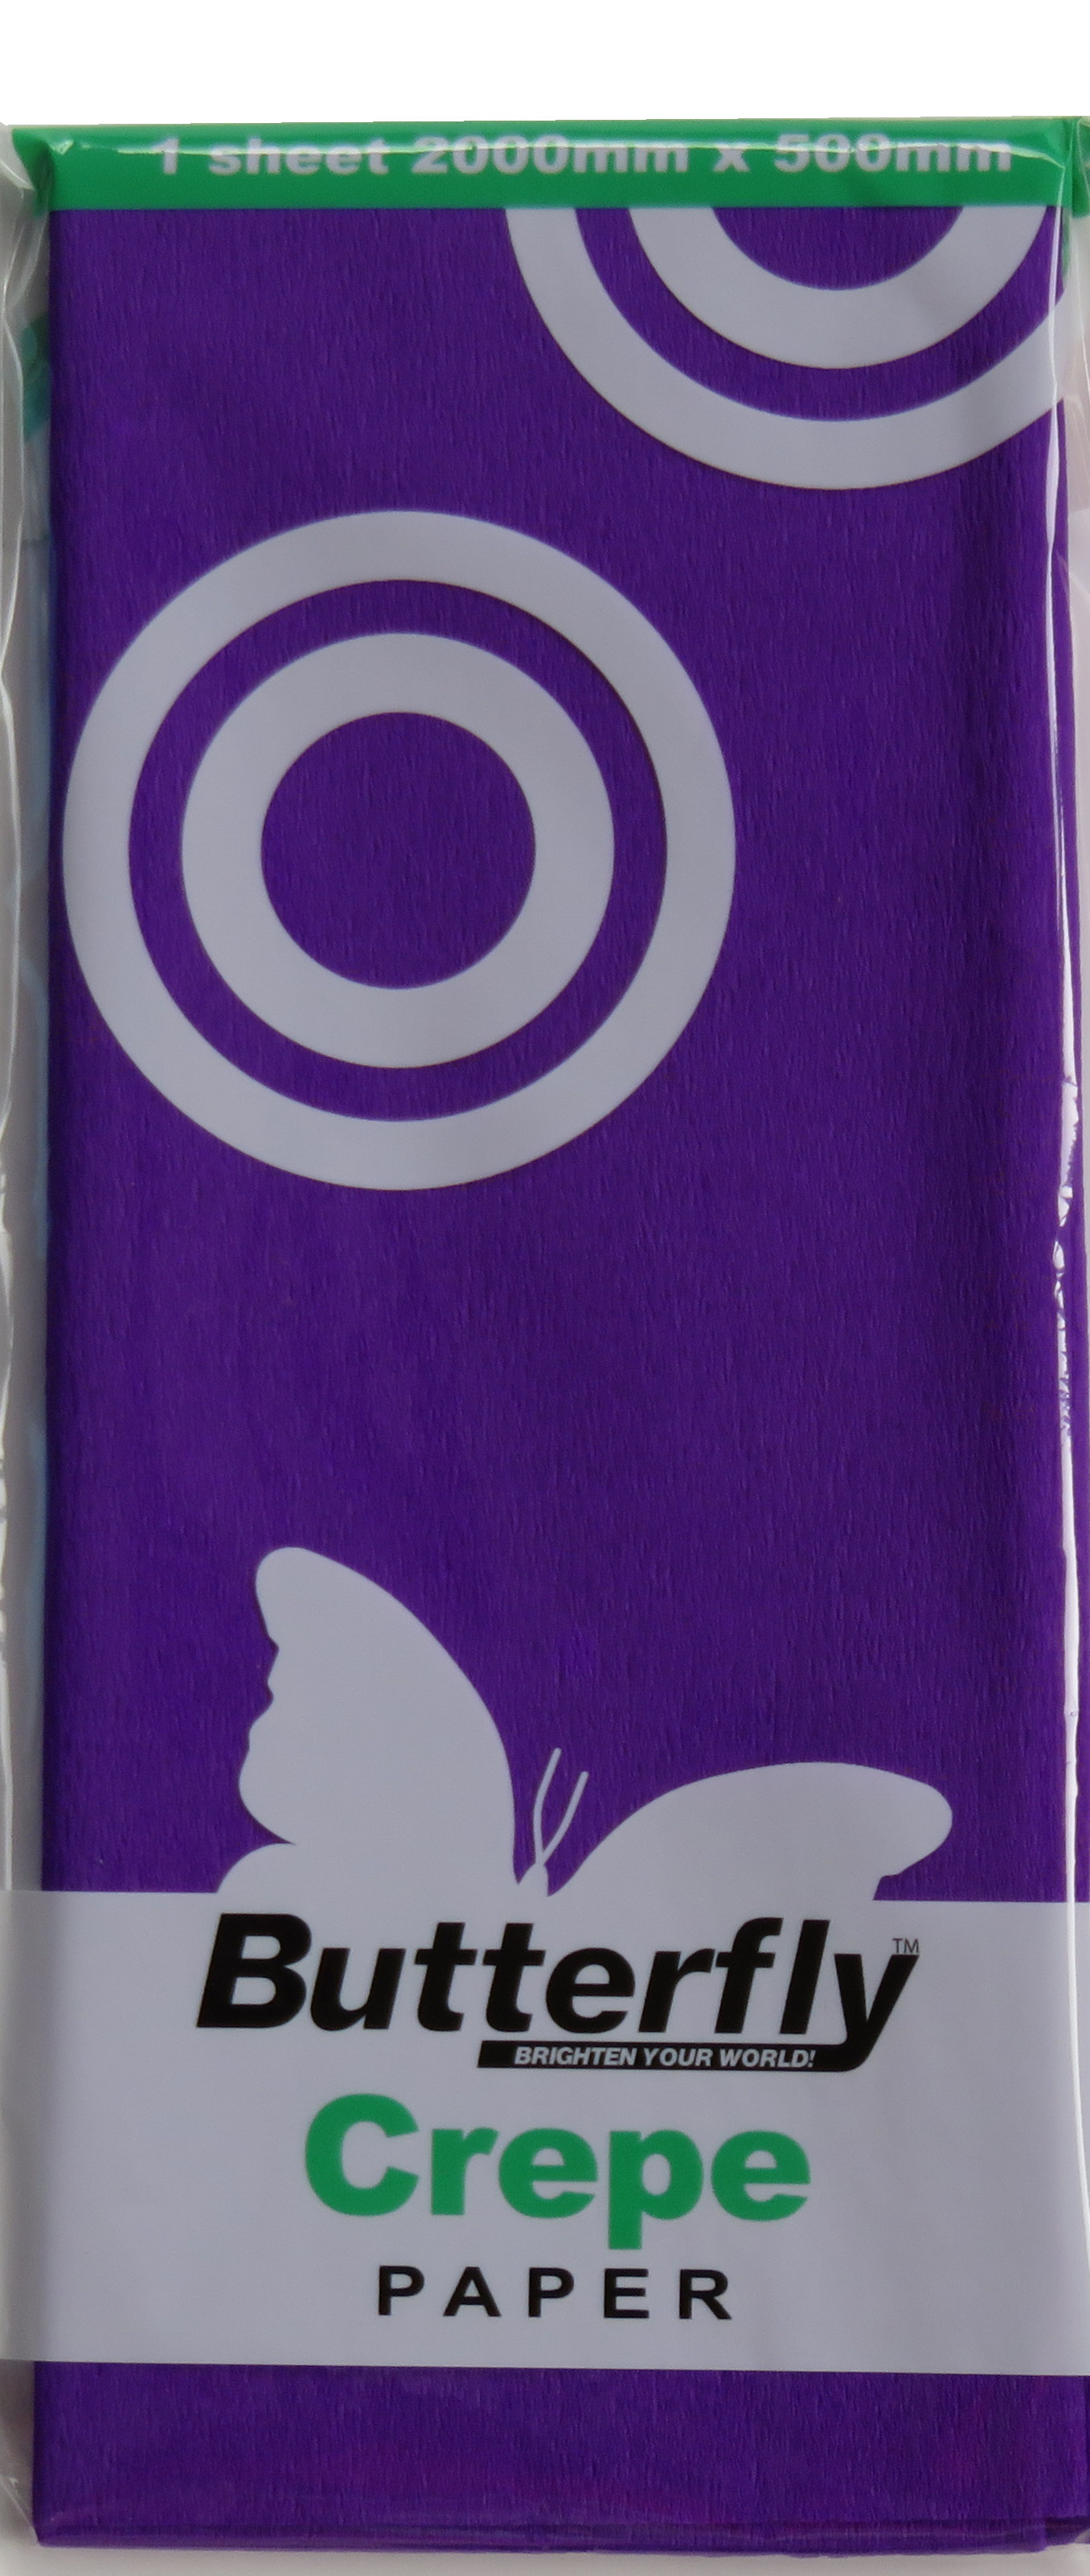 Crepe paper - 1 Sheet (2m x 500mm) Purple